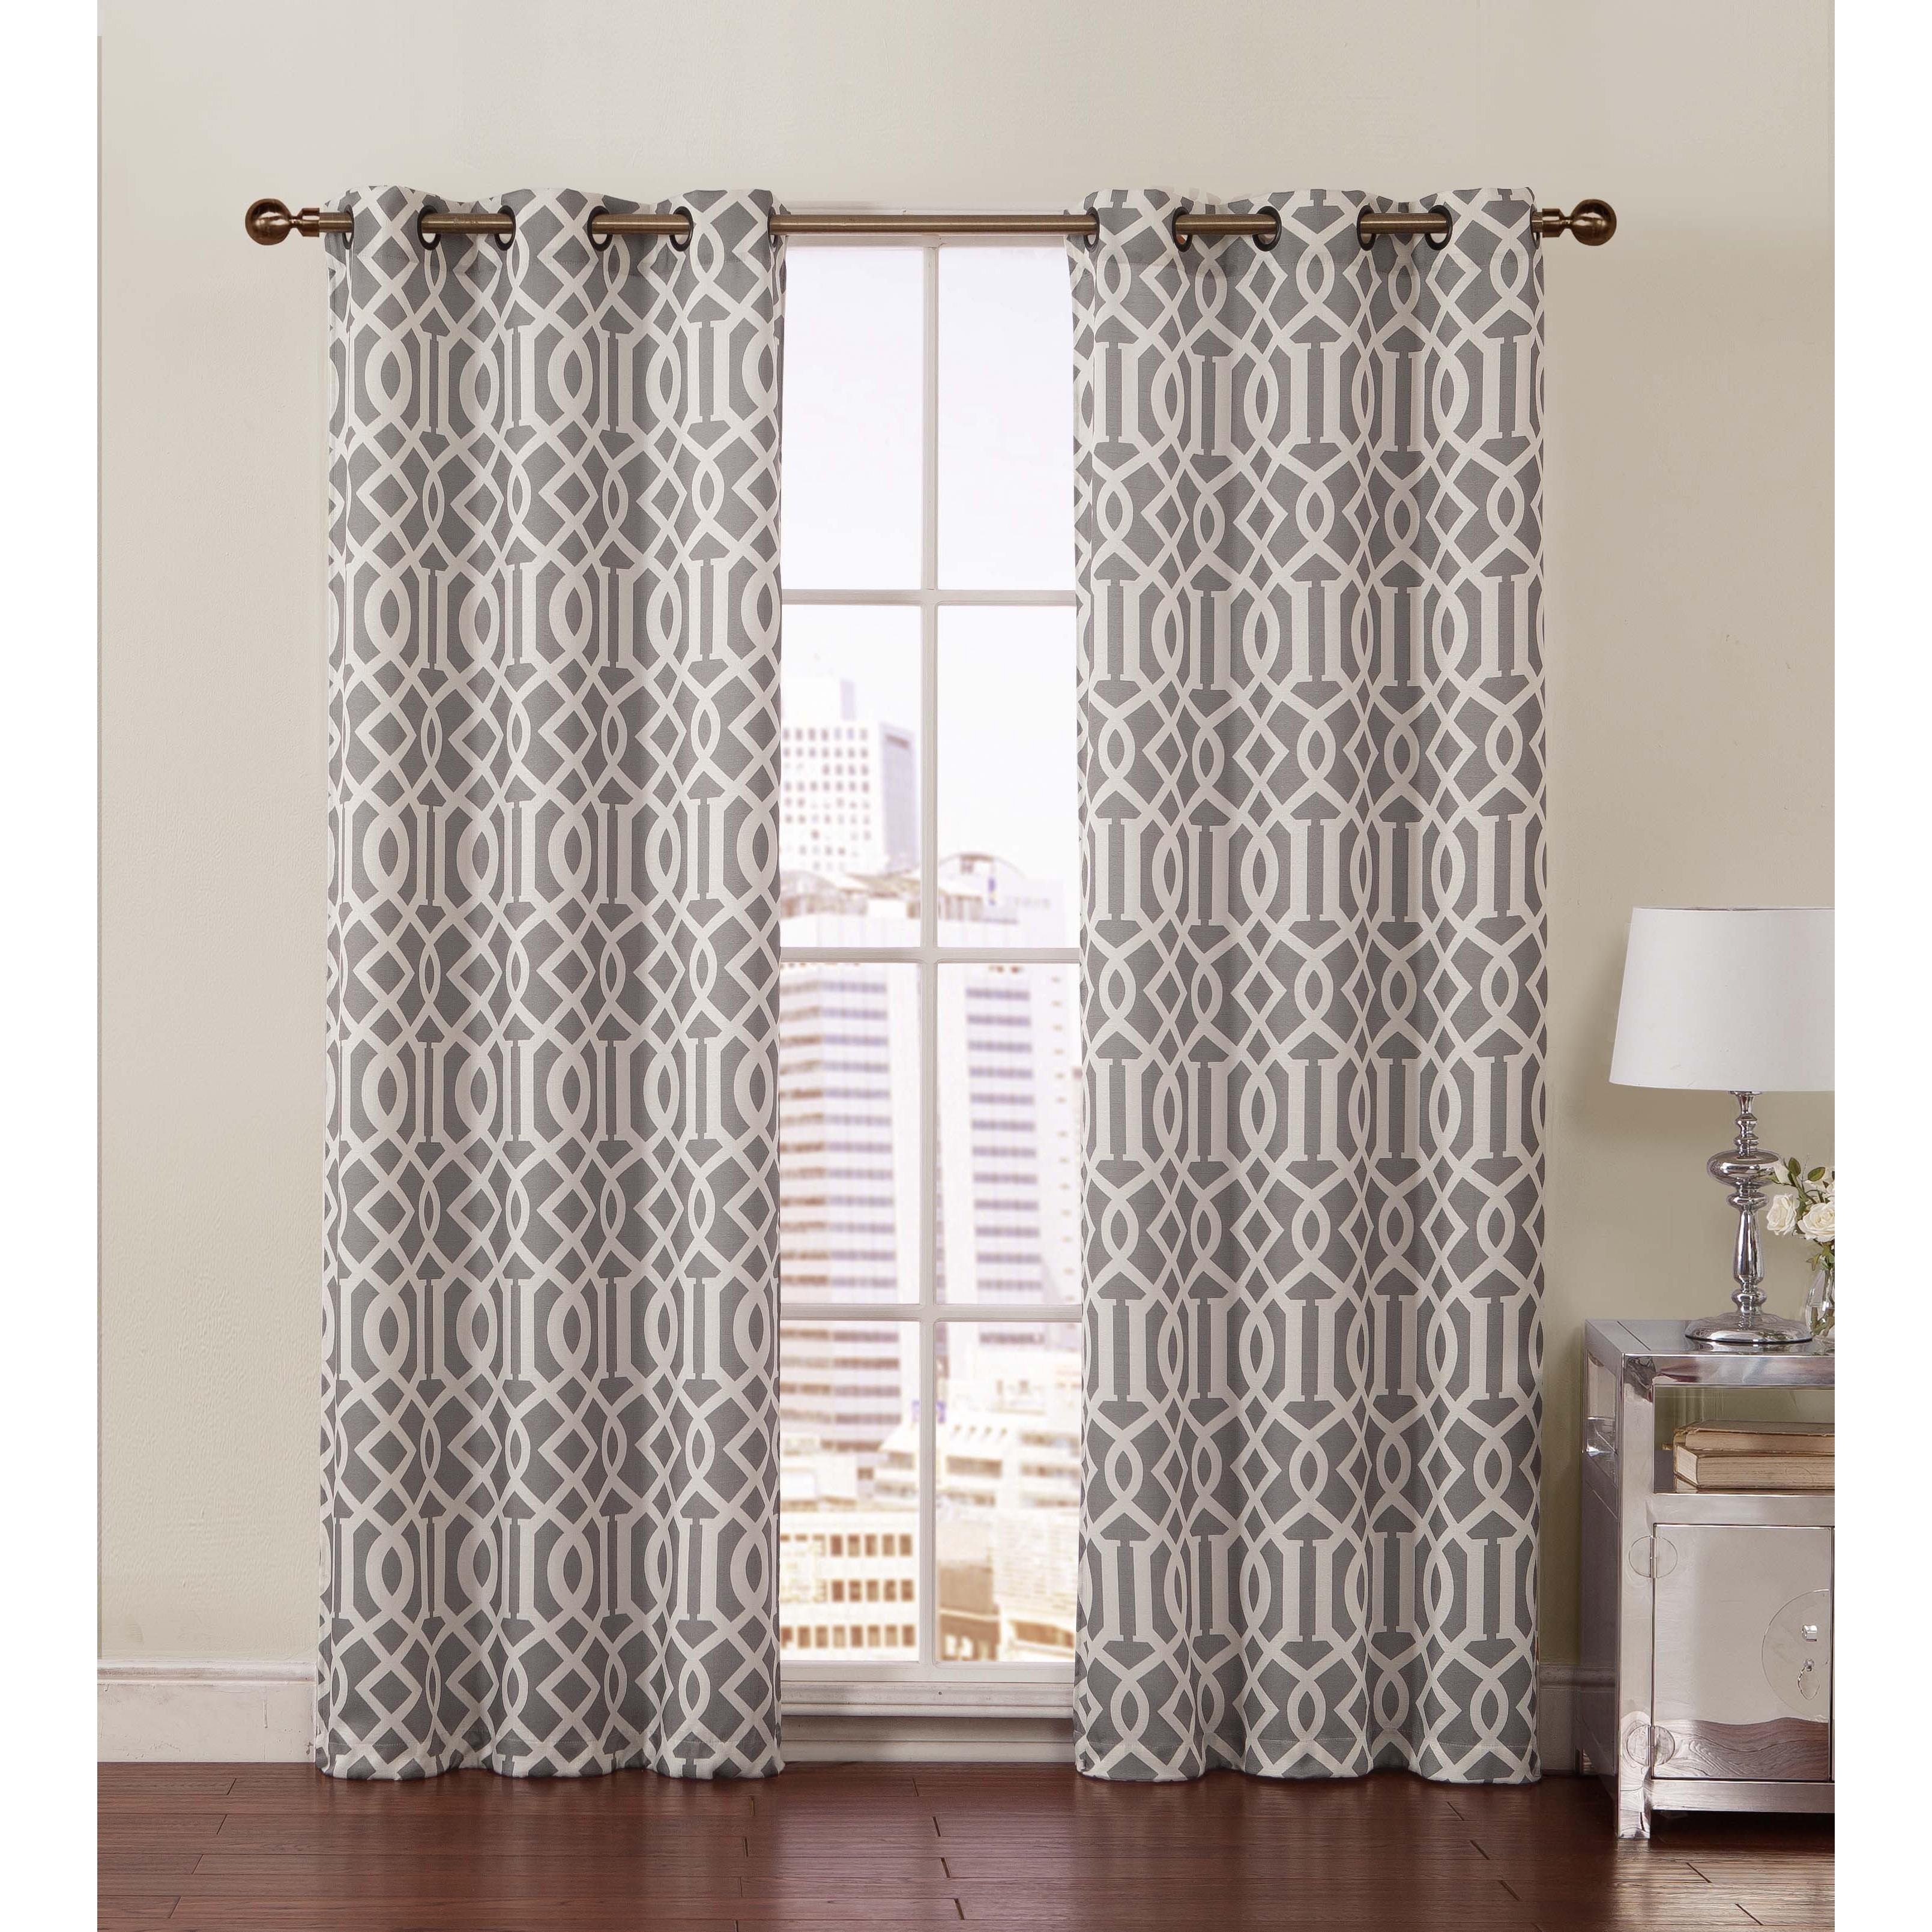 Victoria Classics Aaron Room Grommet Top 84-inch Curtain Panel Pair